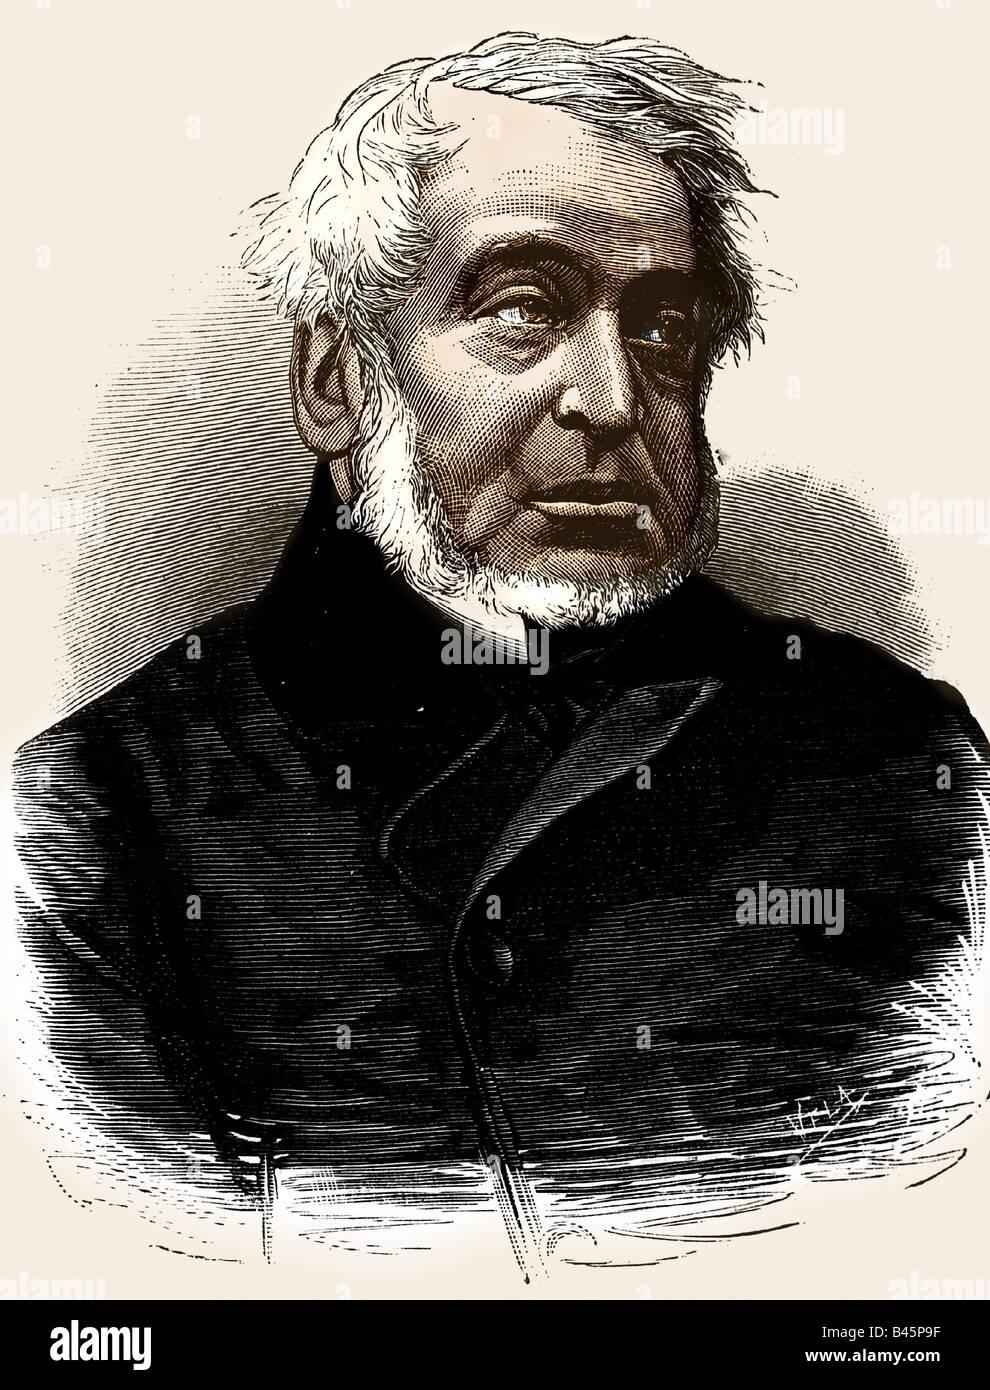 Rothschild, Lionel de 22.11.1808 - 3.6.1879, British banker & politician, portrait, engraving 1879, Additional - Stock Image